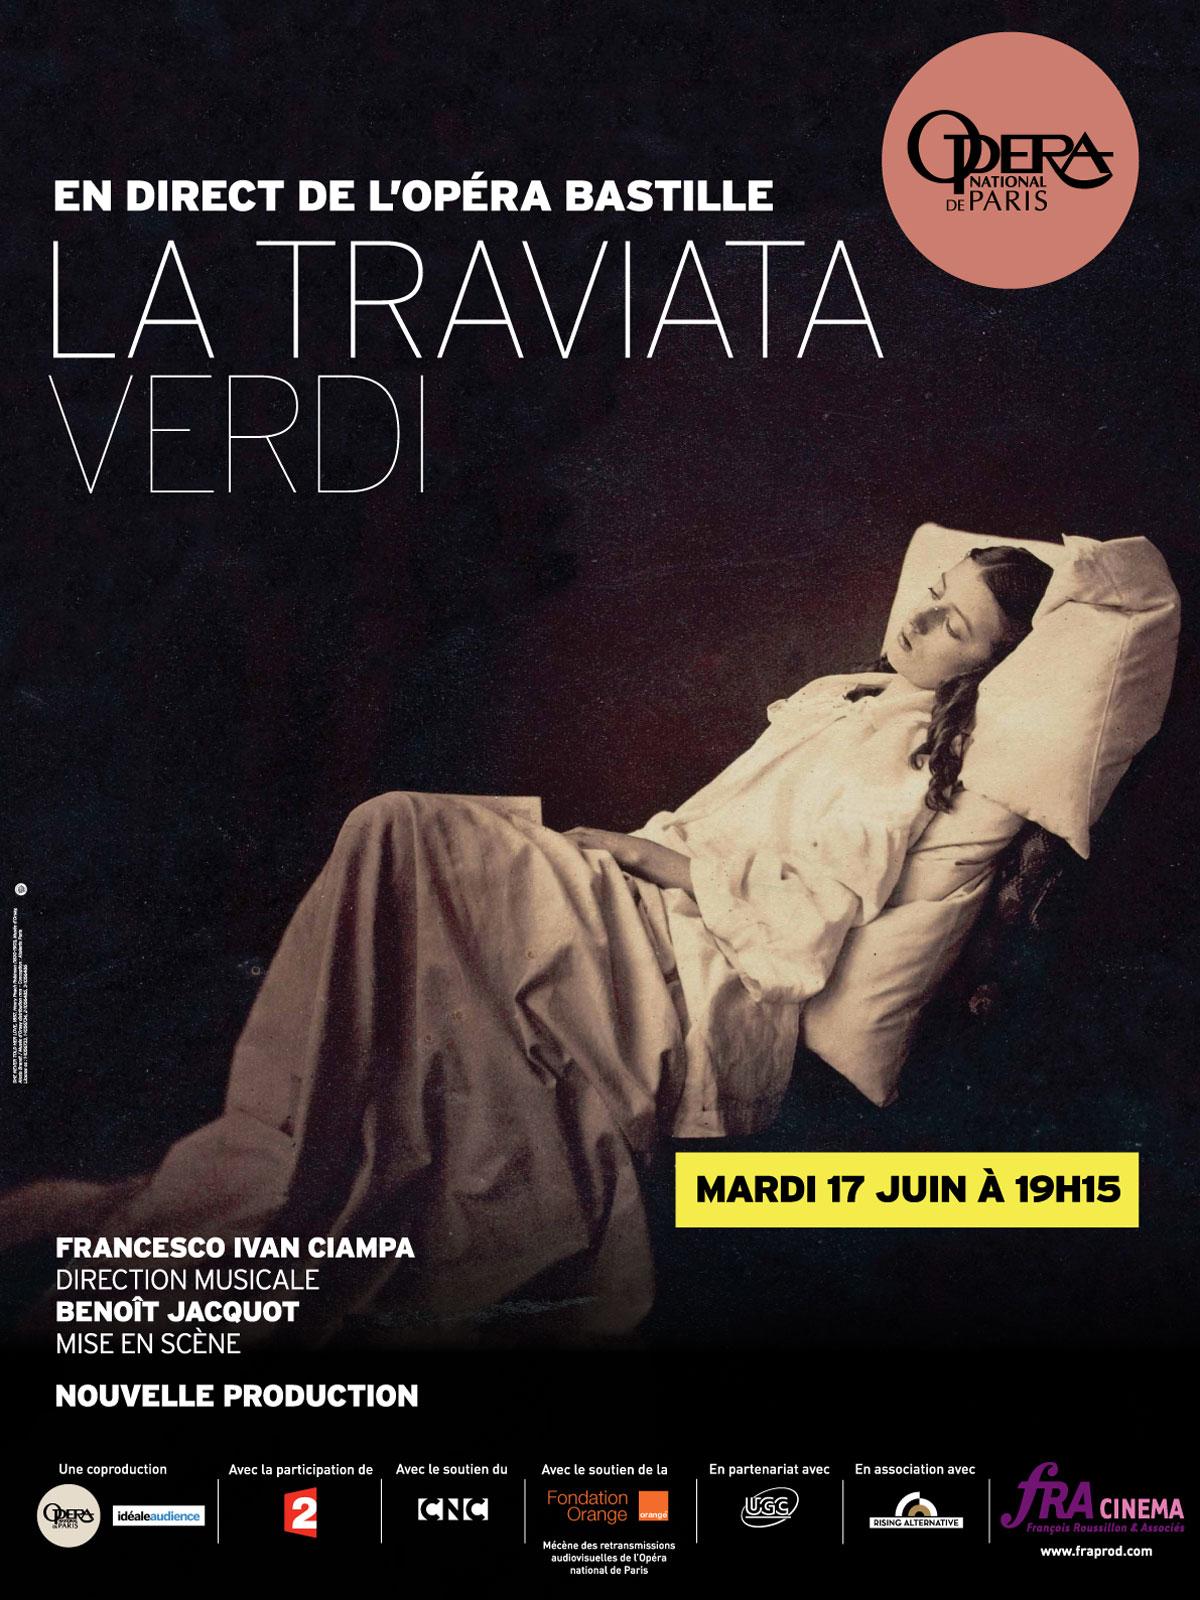 La Traviata (UGC Viva l'Opéra - FRA Cinéma)